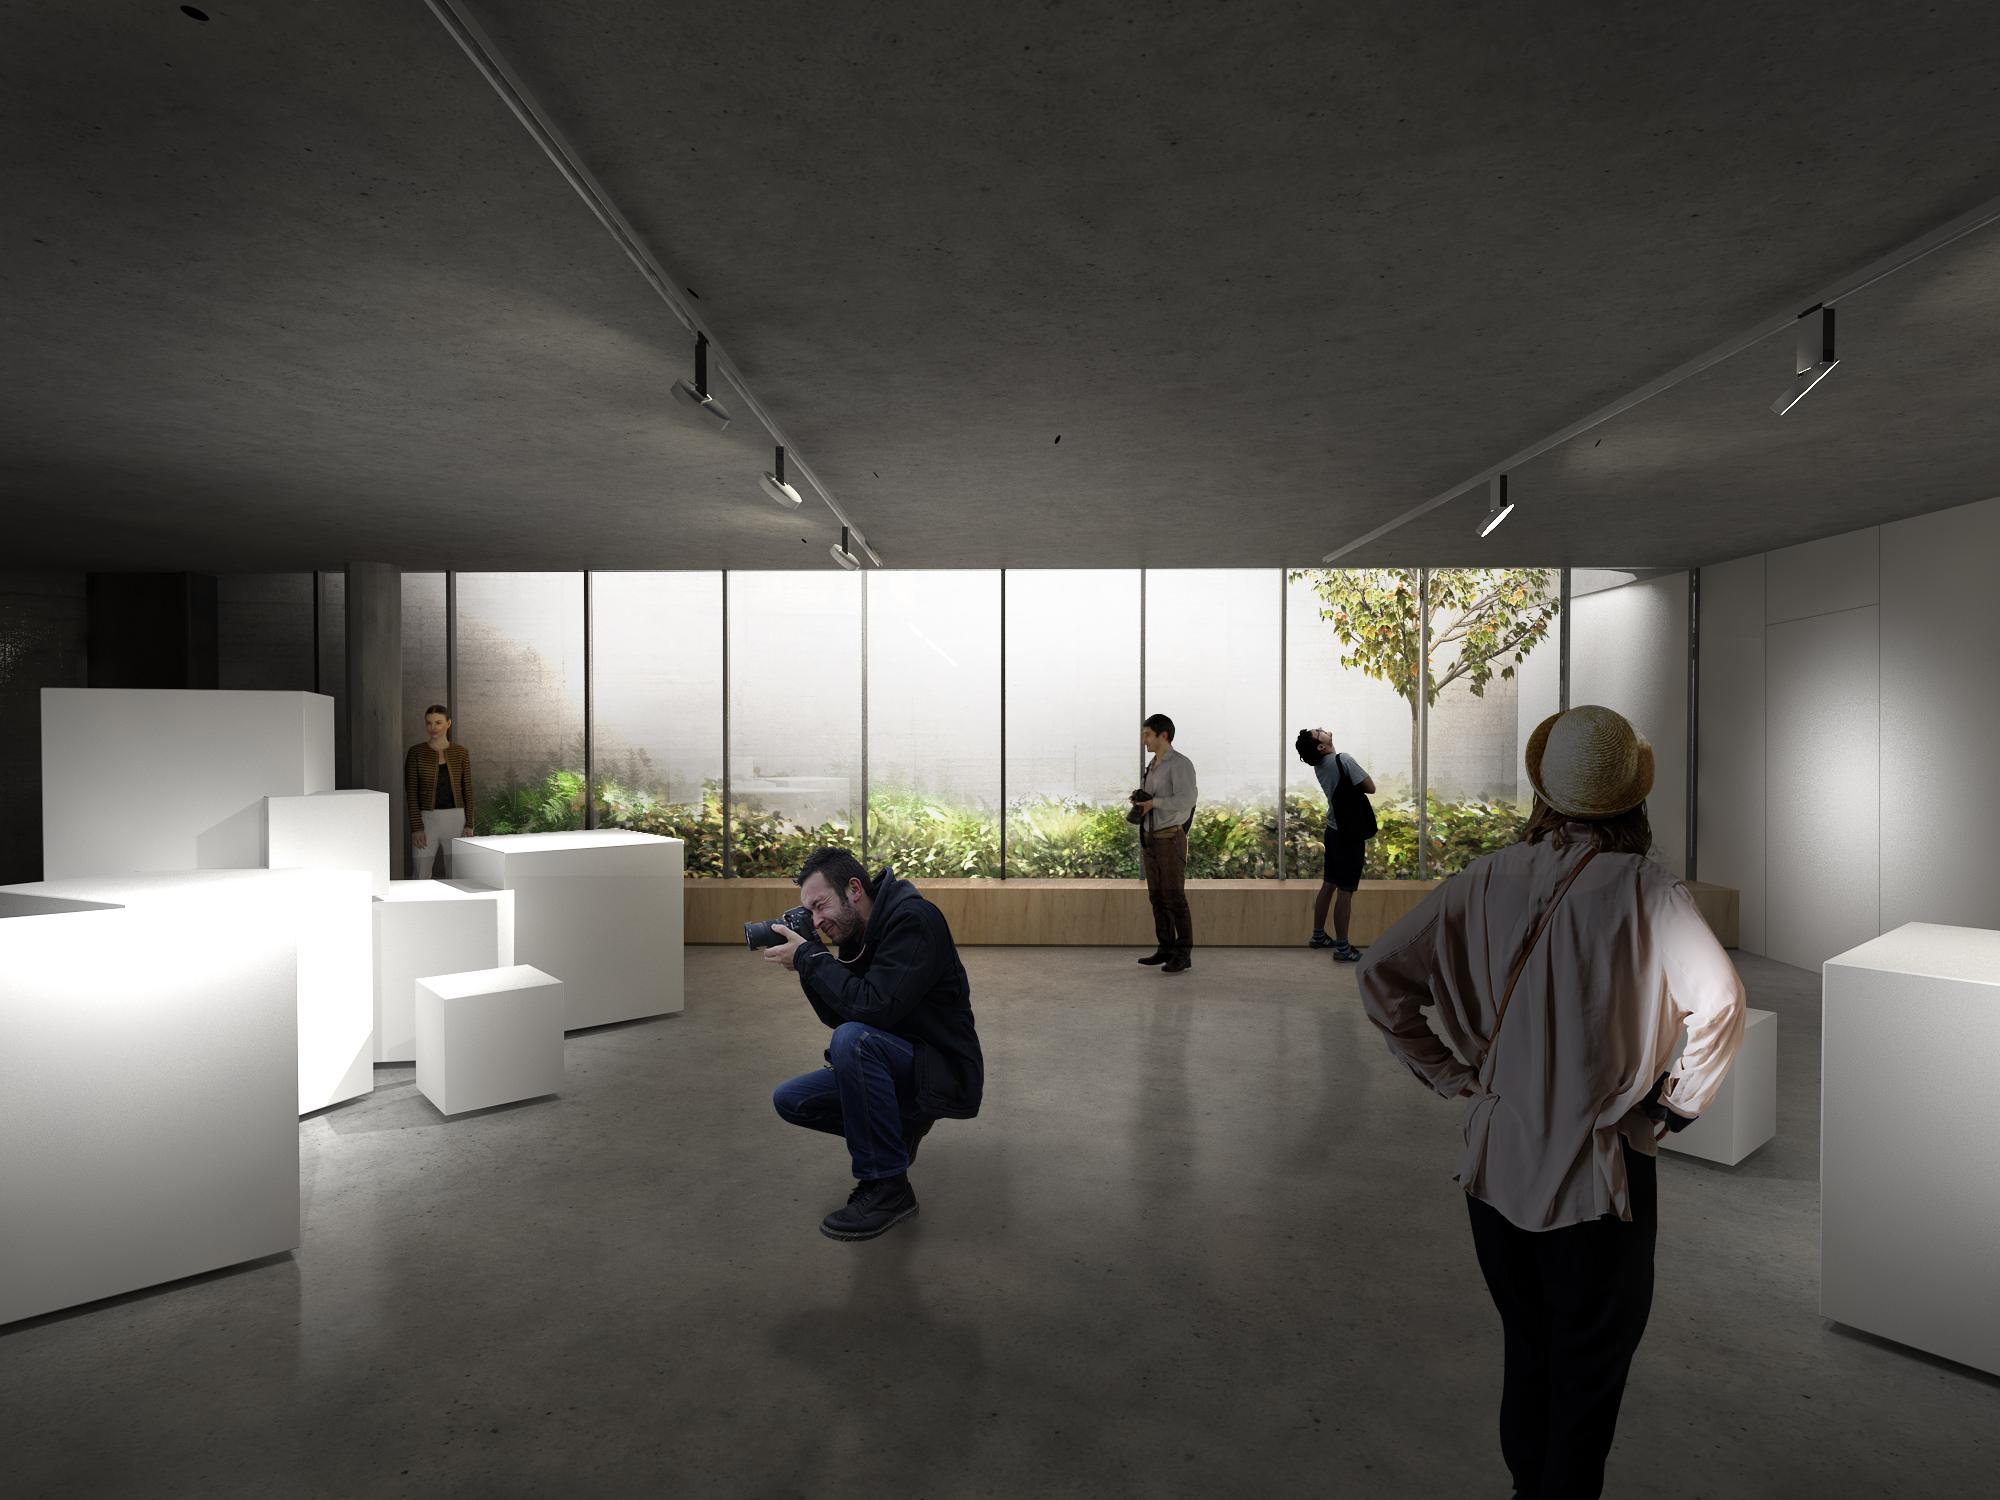 Sala subterranea